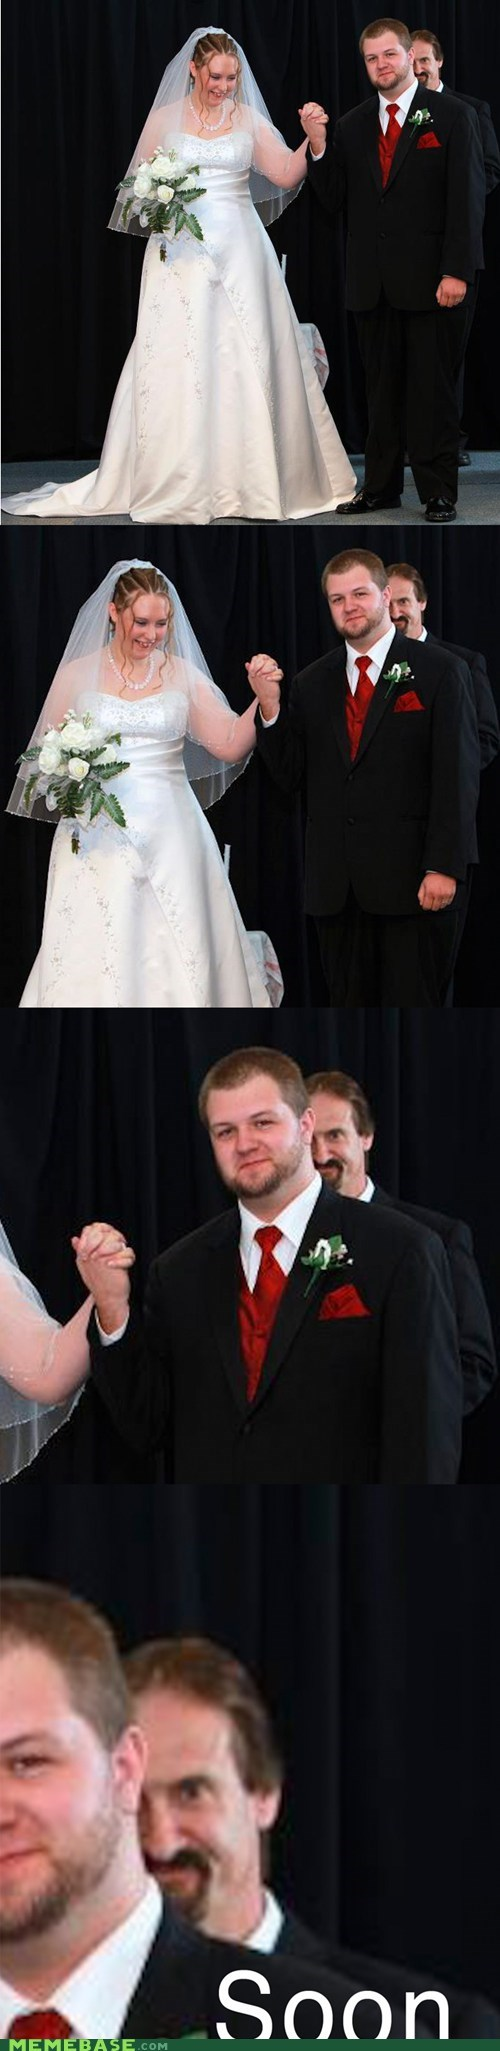 SOON photobombed weddings - 6461204992